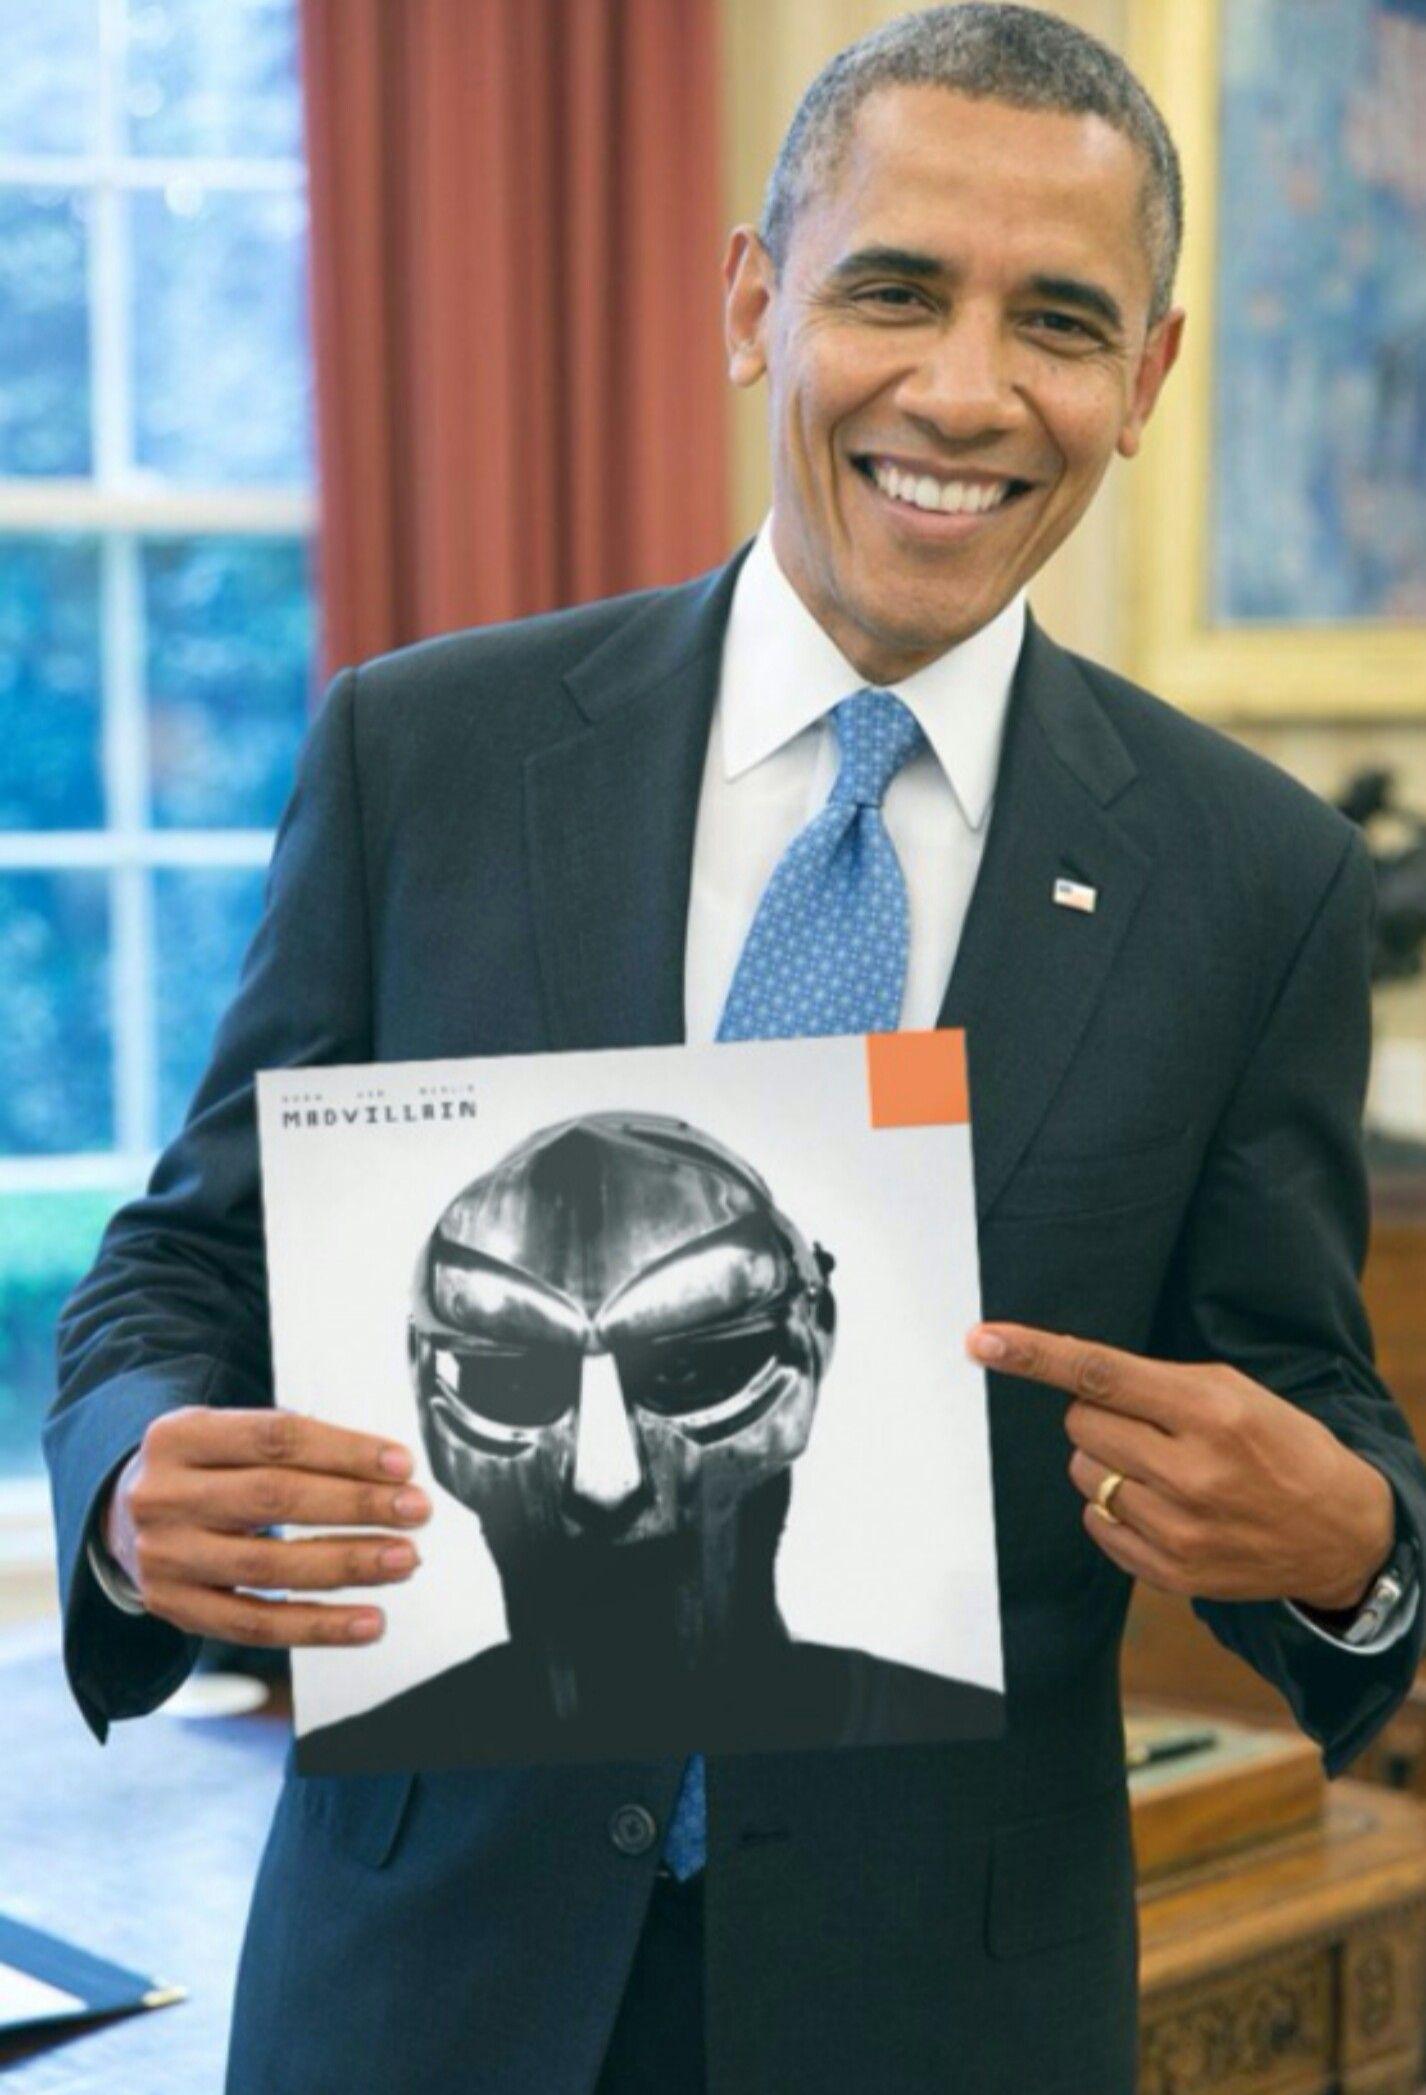 Even President Obama S A Big Mf Doom Fan Hip Hop And R B Kendrick Lamar Kendrick